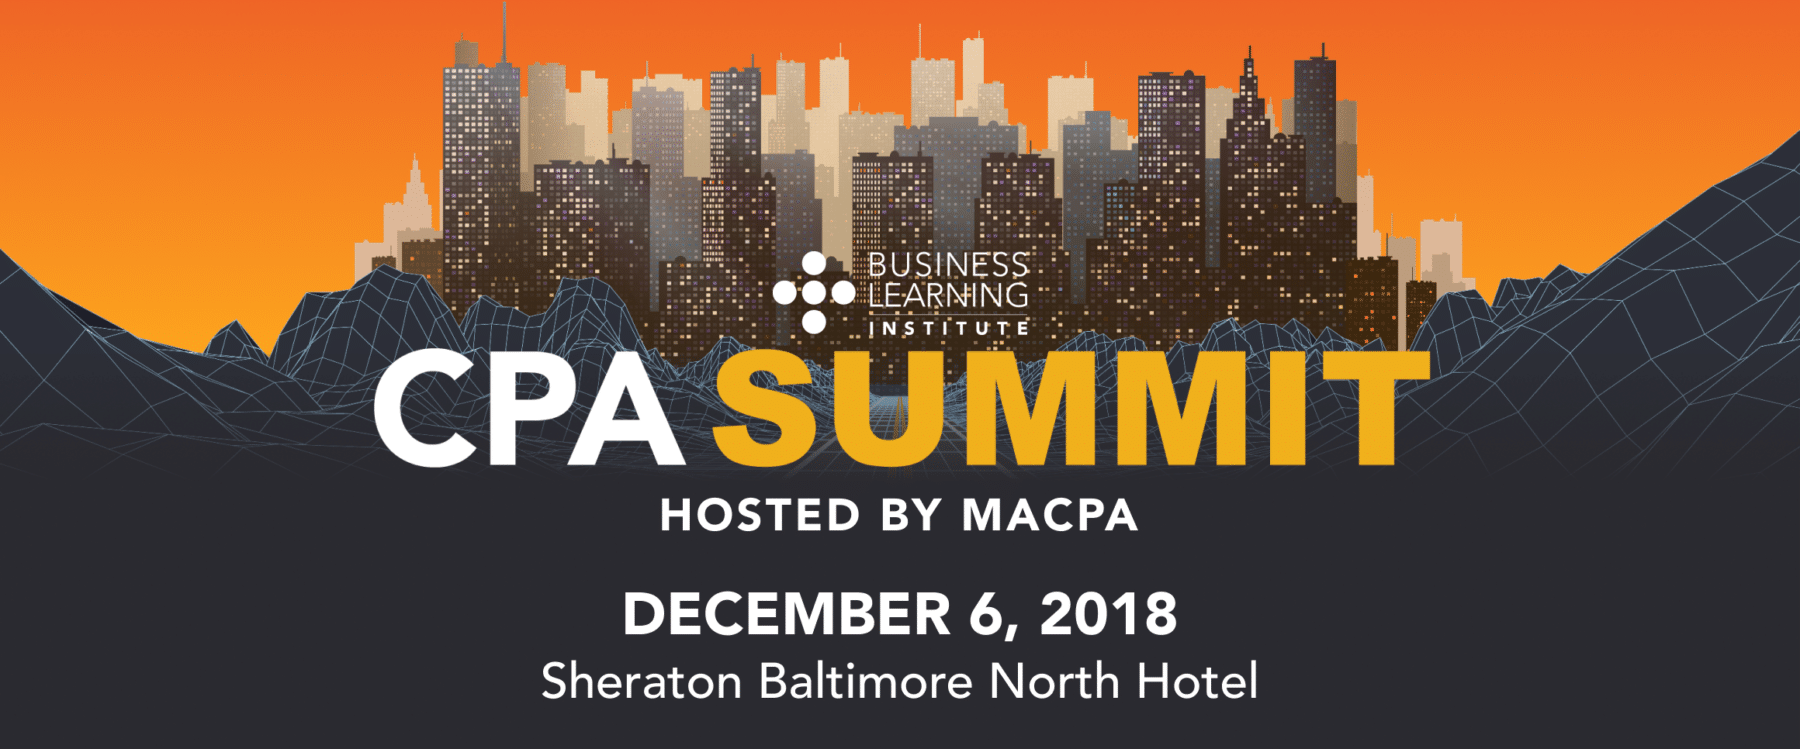 2018 cpa summit maryland association of cpas macpa